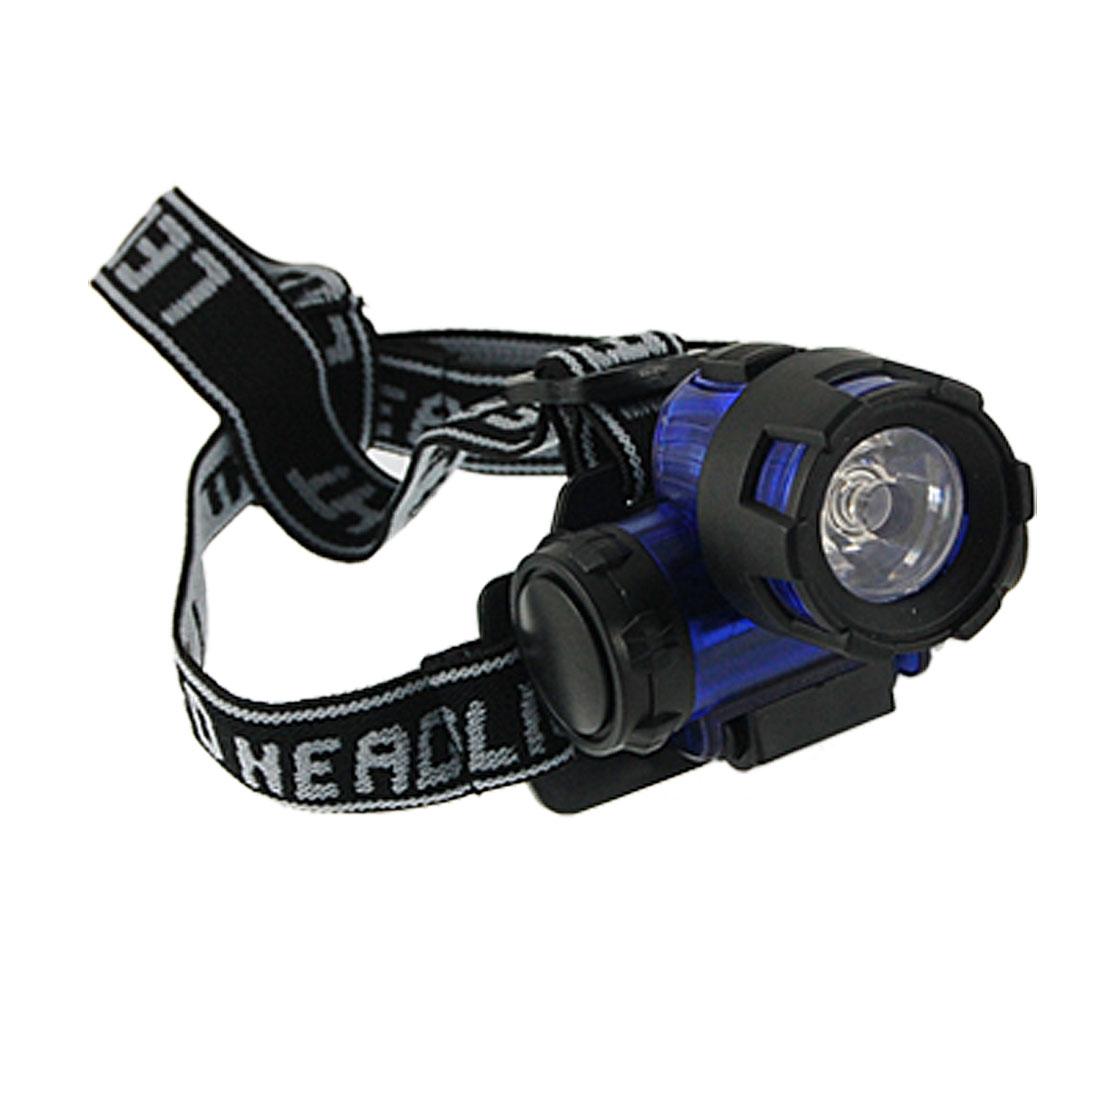 Adjustable Headstrap LED Camping Travel Headlight Lamp